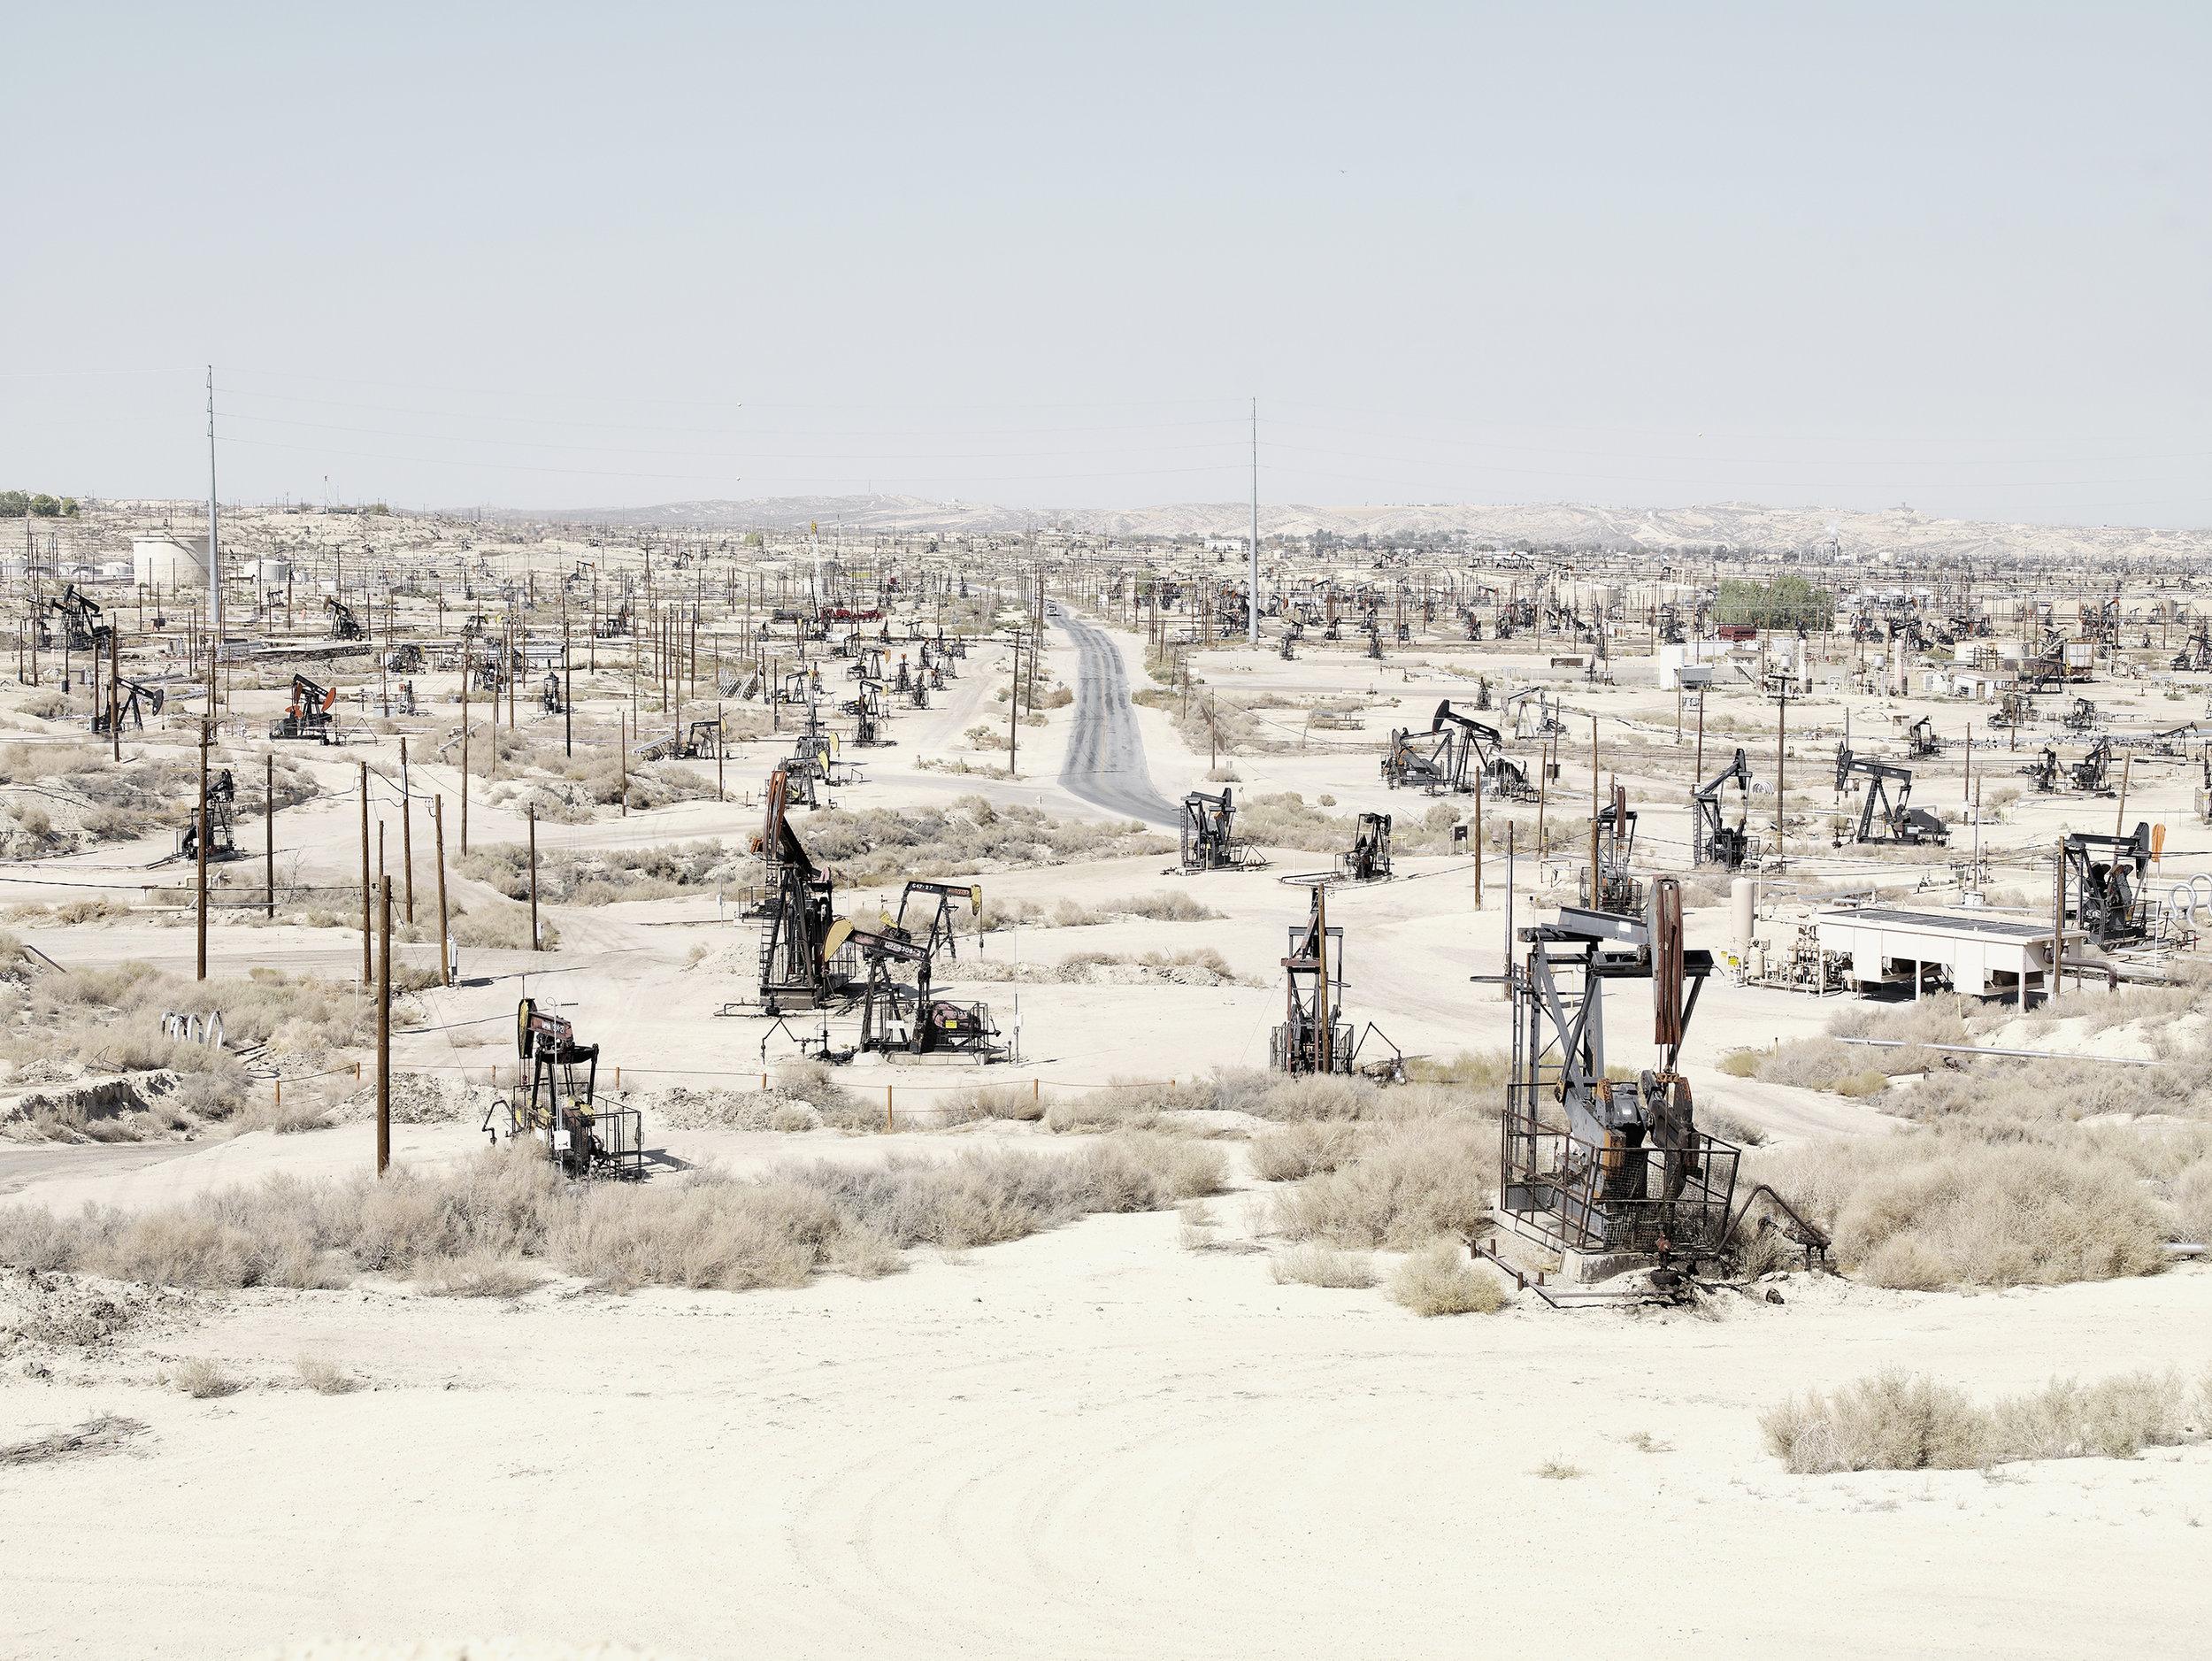 Petroleum field 1, USA, 2007.